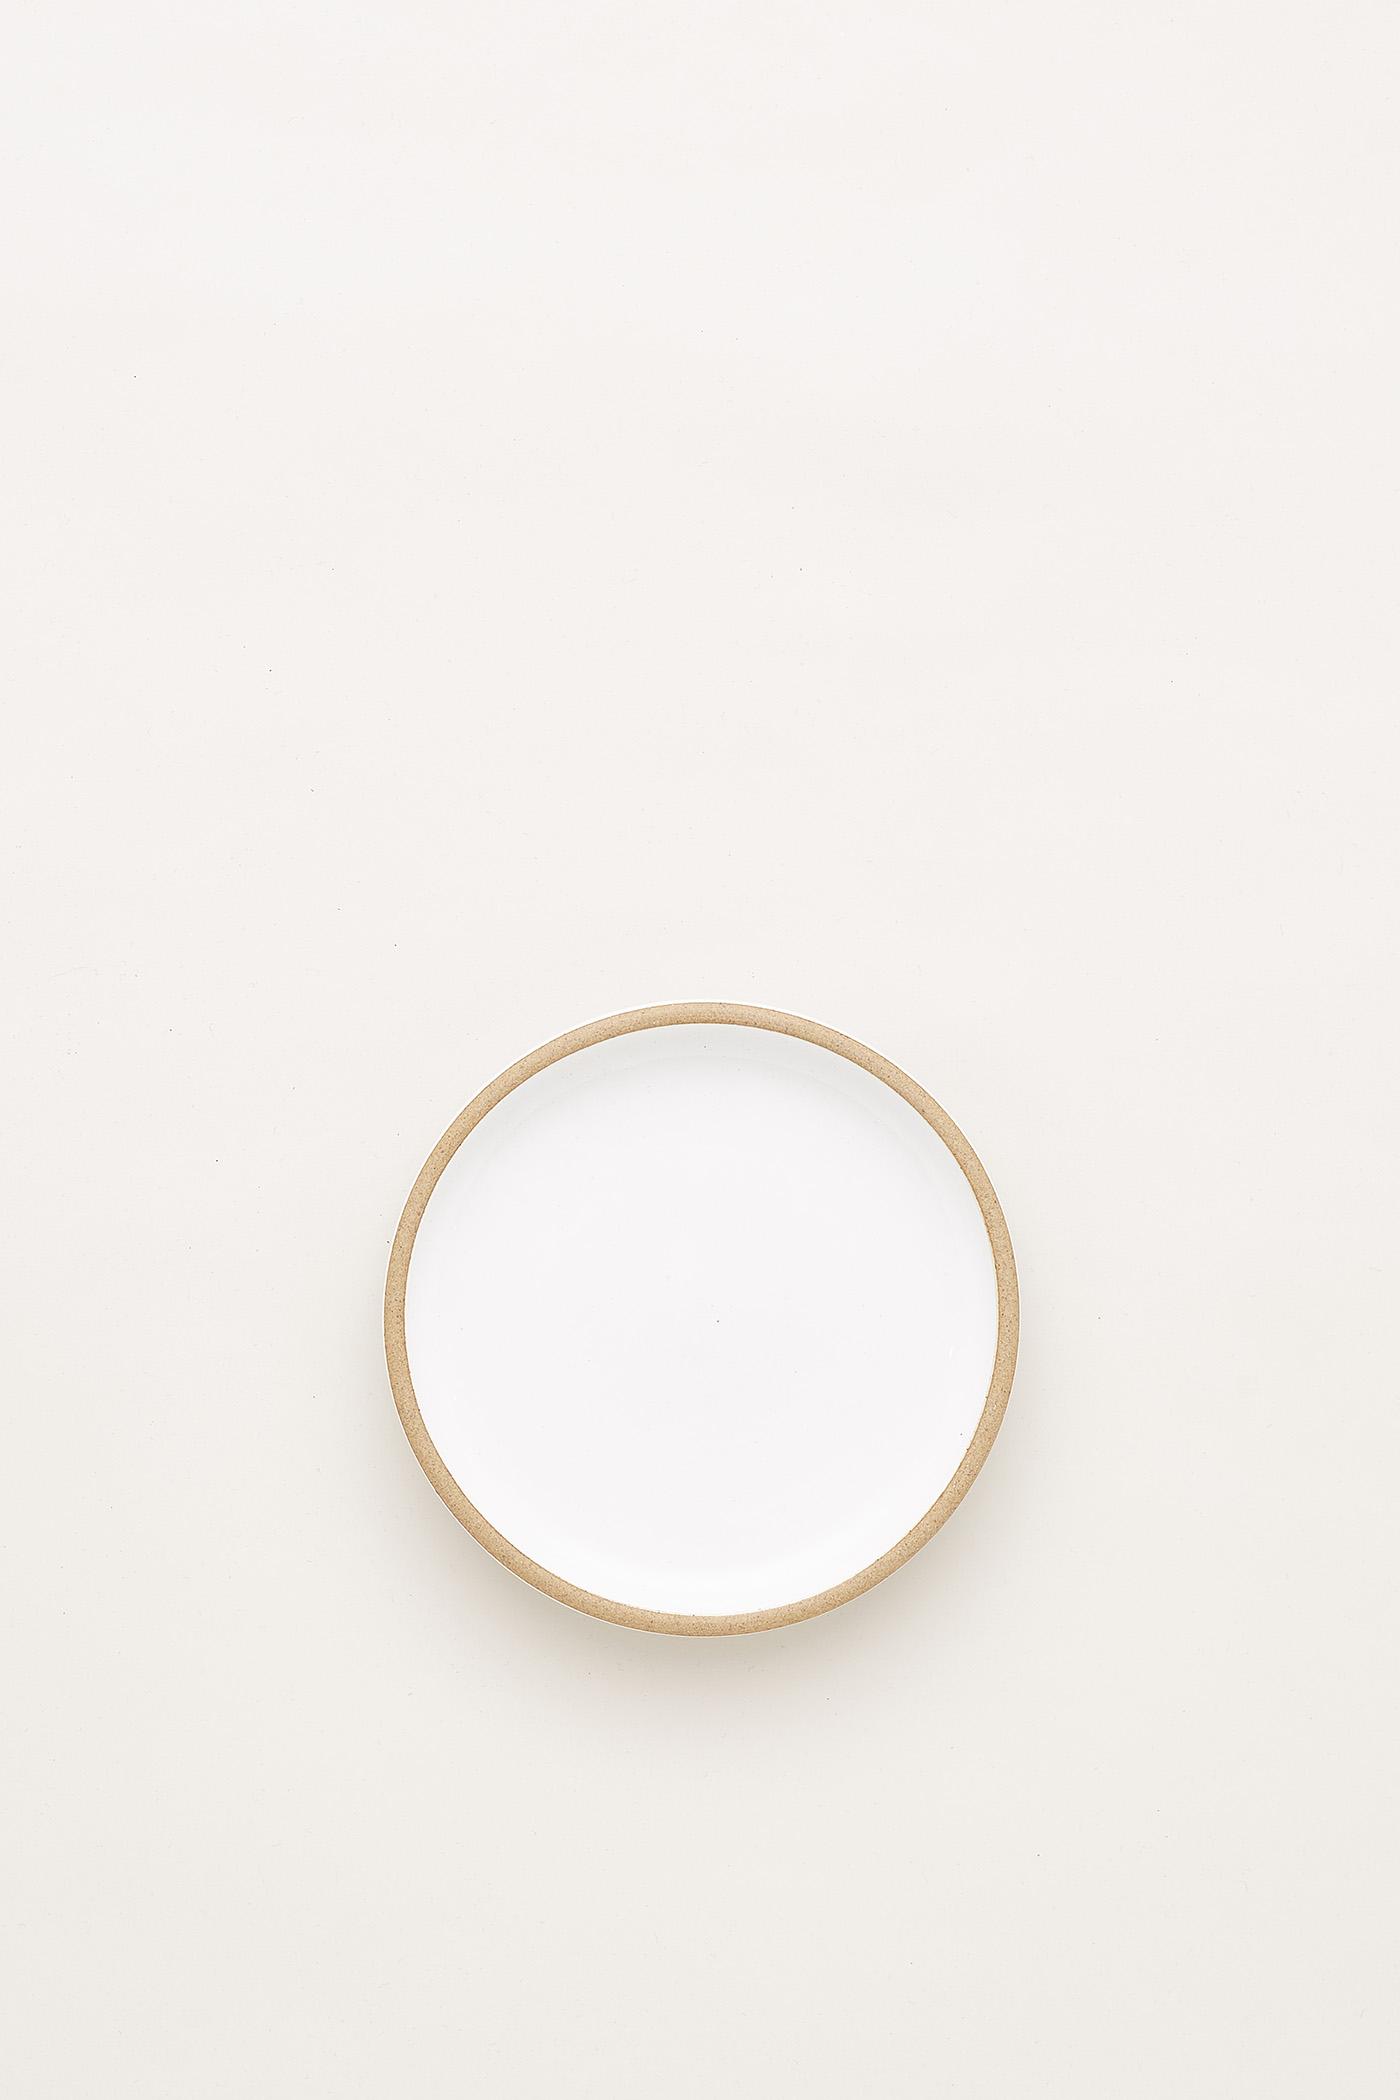 Shika Small Round Plate